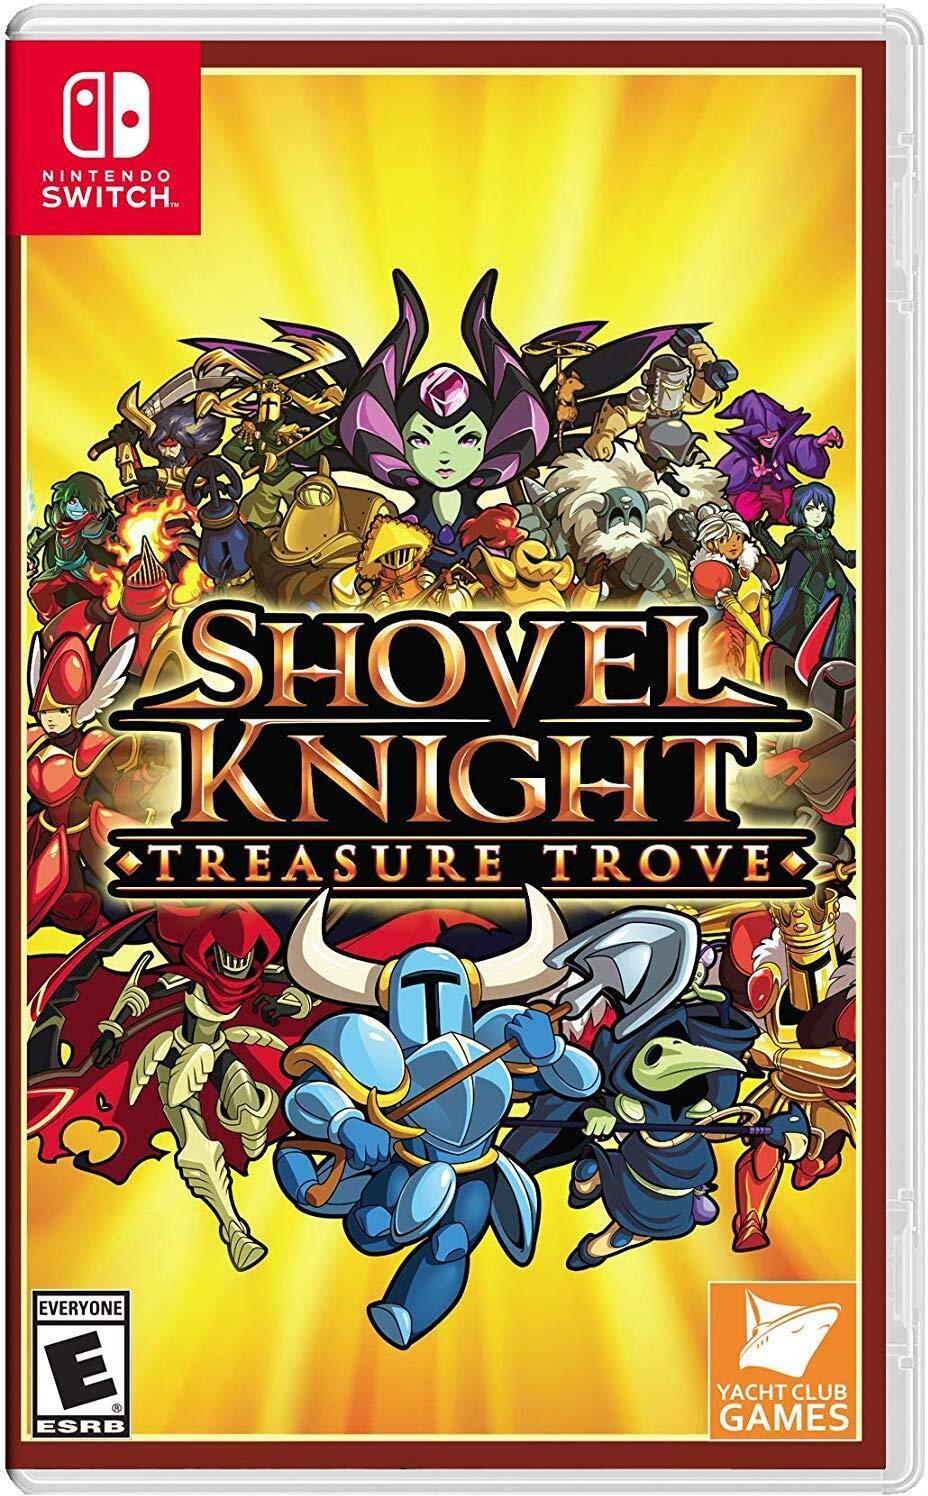 Shovel Knight: Treasure Trove (US) - Nintendo Switch